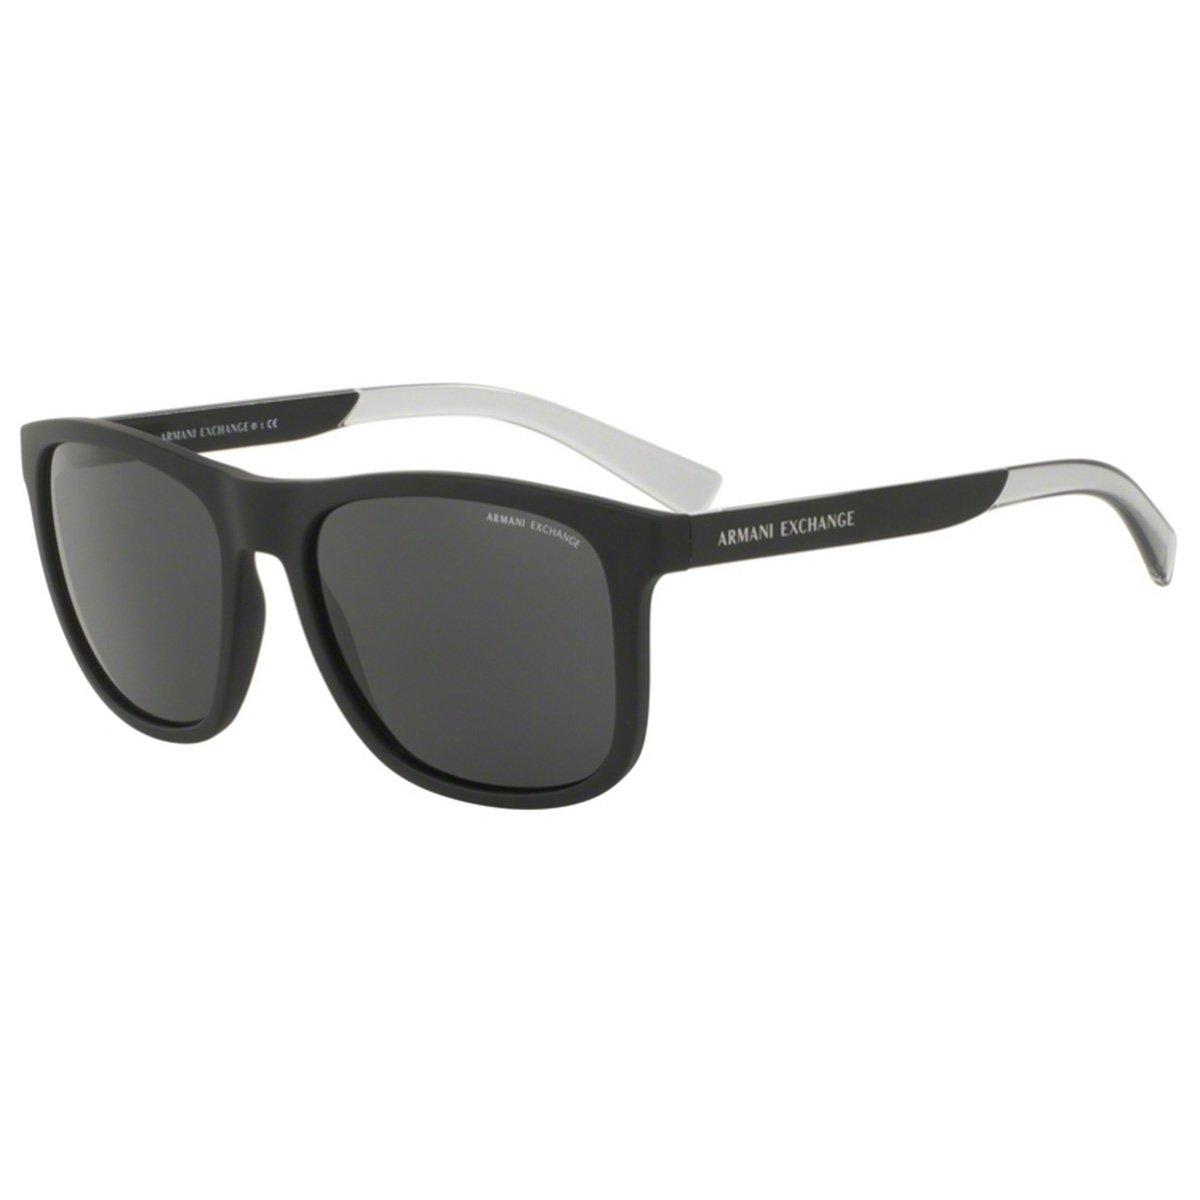 Compre Óculos de Sol Armani Exchange em 10X   Tri-Jóia Shop 3c83caa3d1